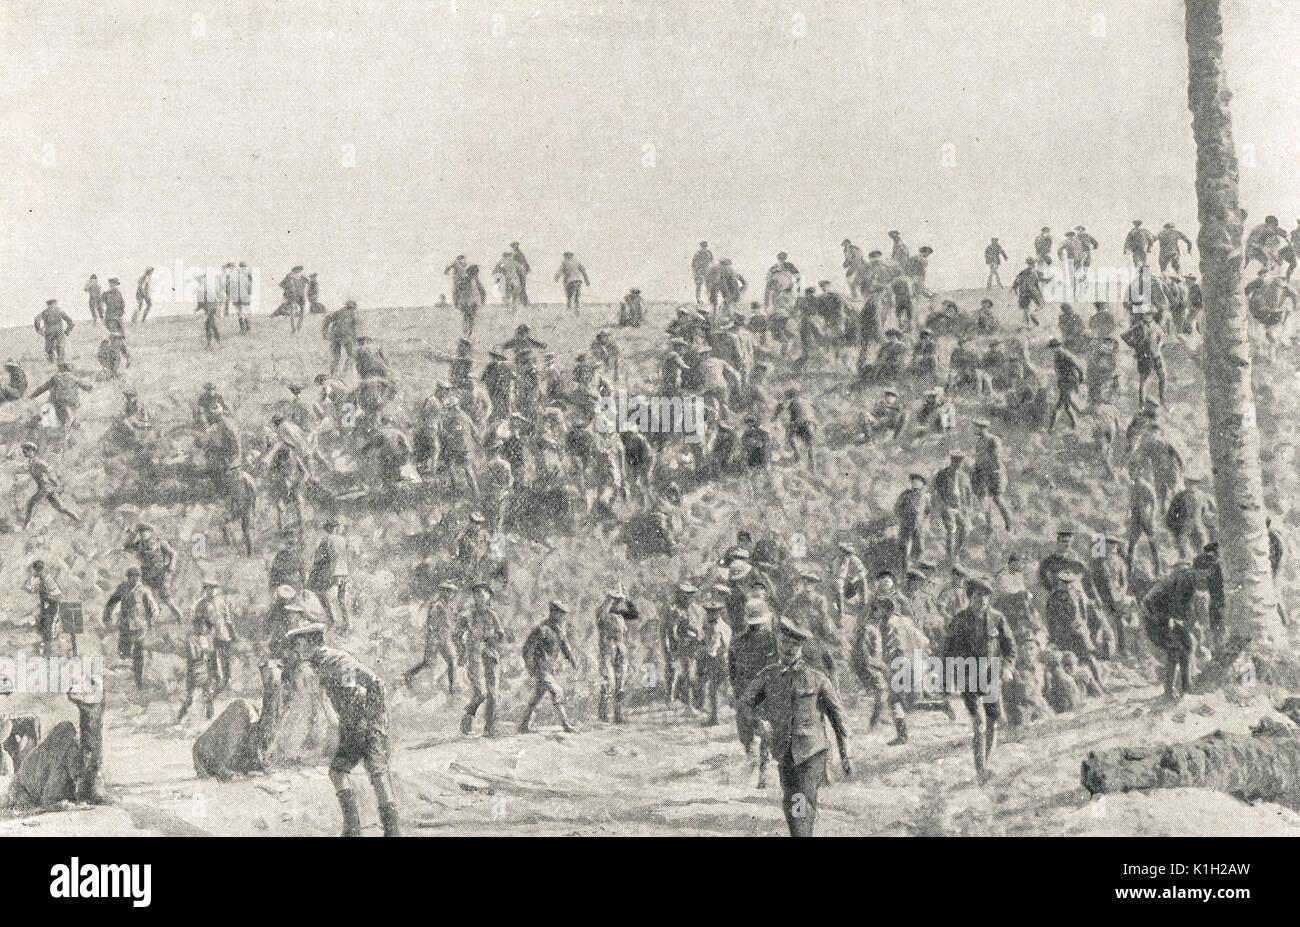 Air raid interrupting Boxing match, WW1 - Stock Image